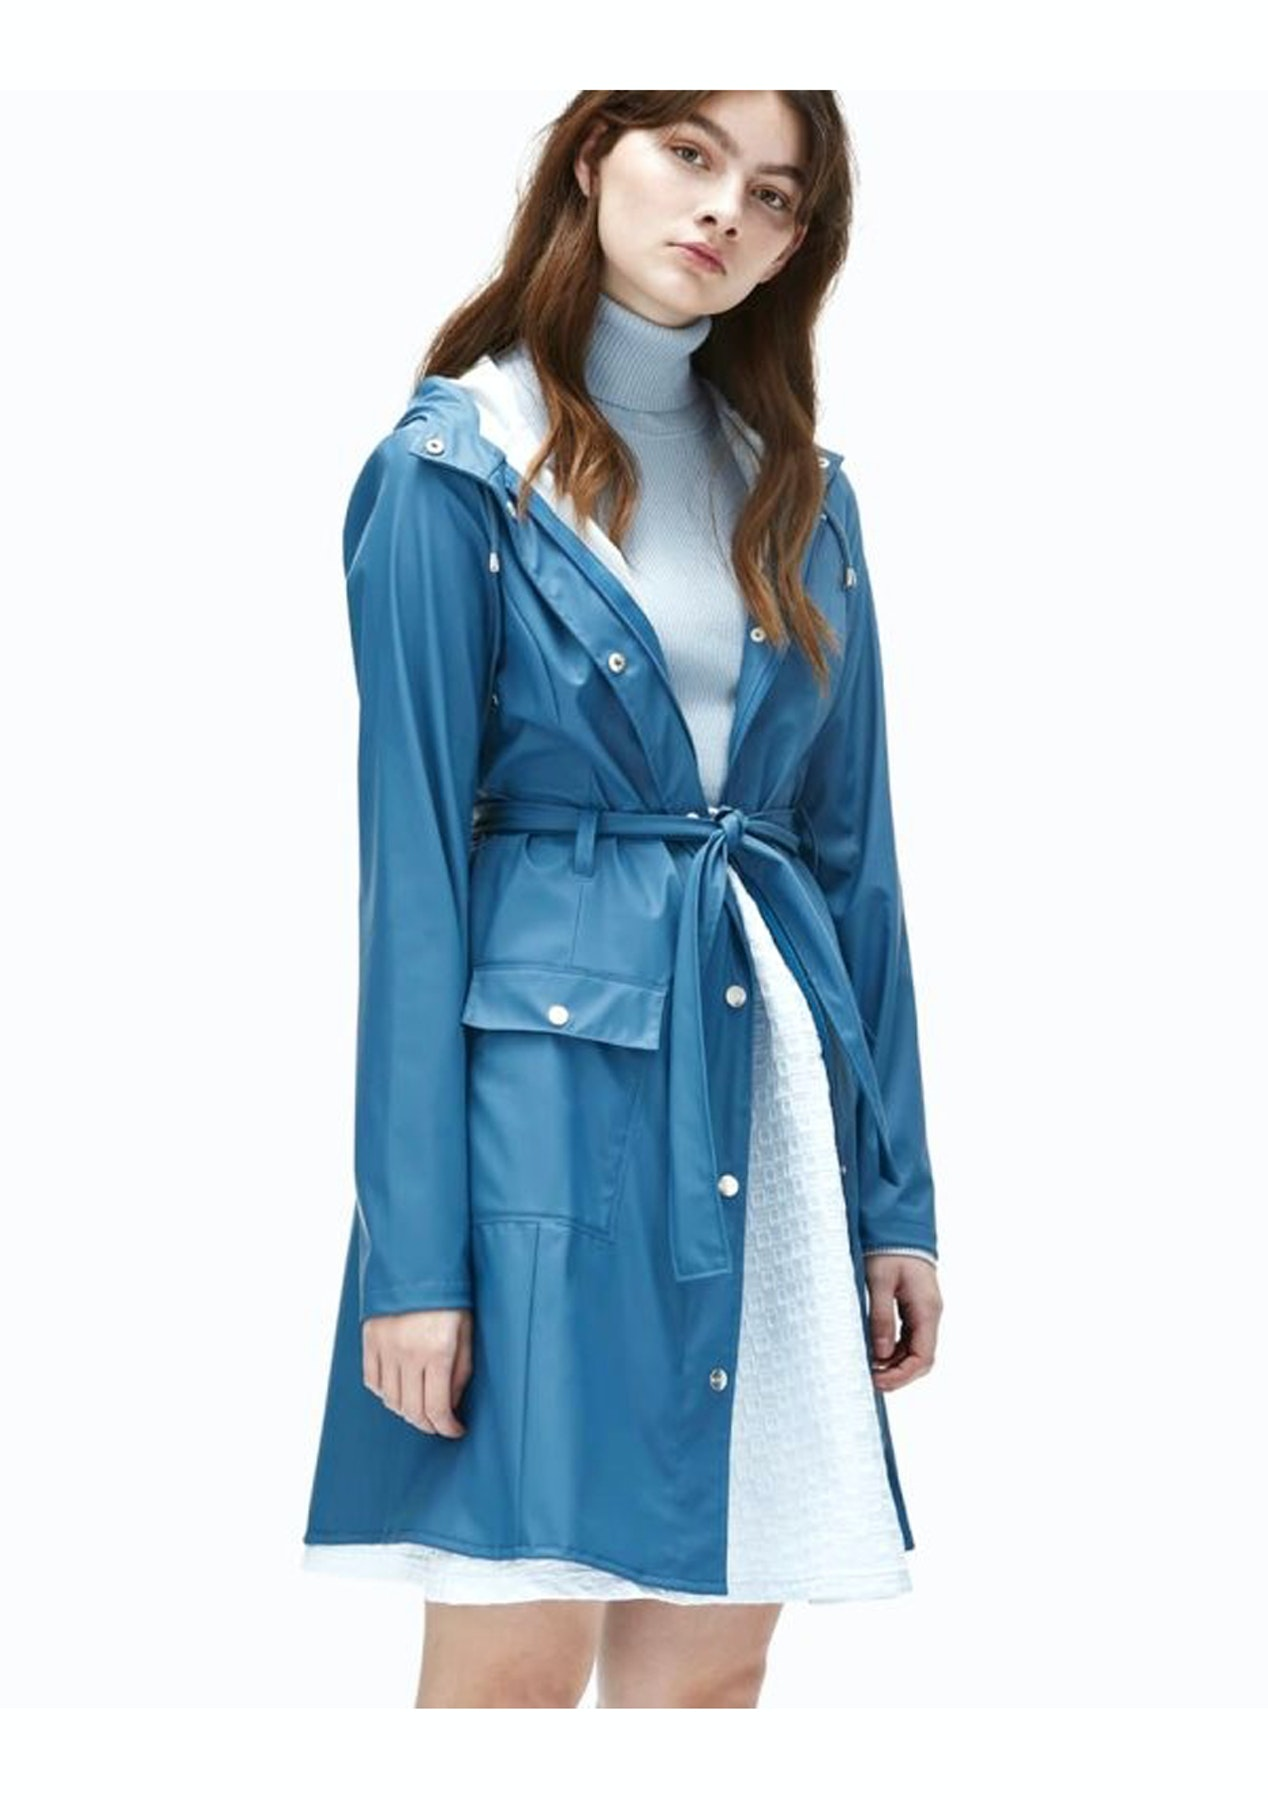 Rains - Womens Curve Jacket - Faded Blue - Rains 50% Off - Onceit 476df01bcd